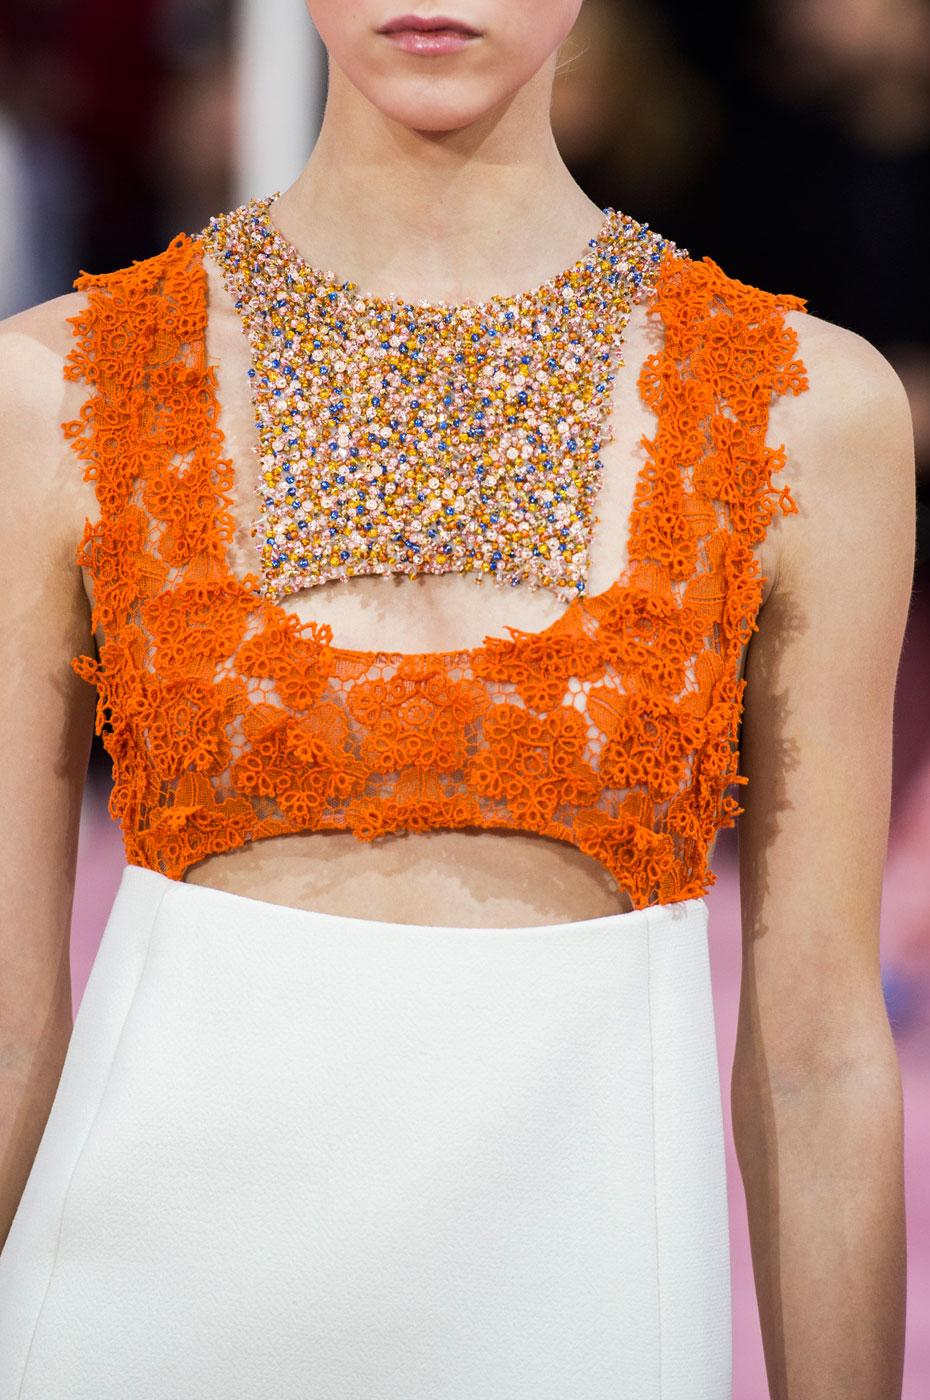 Christian-Dior-fashion-runway-show-close-ups-haute-couture-paris-spring-summer-2015-the-impression-190